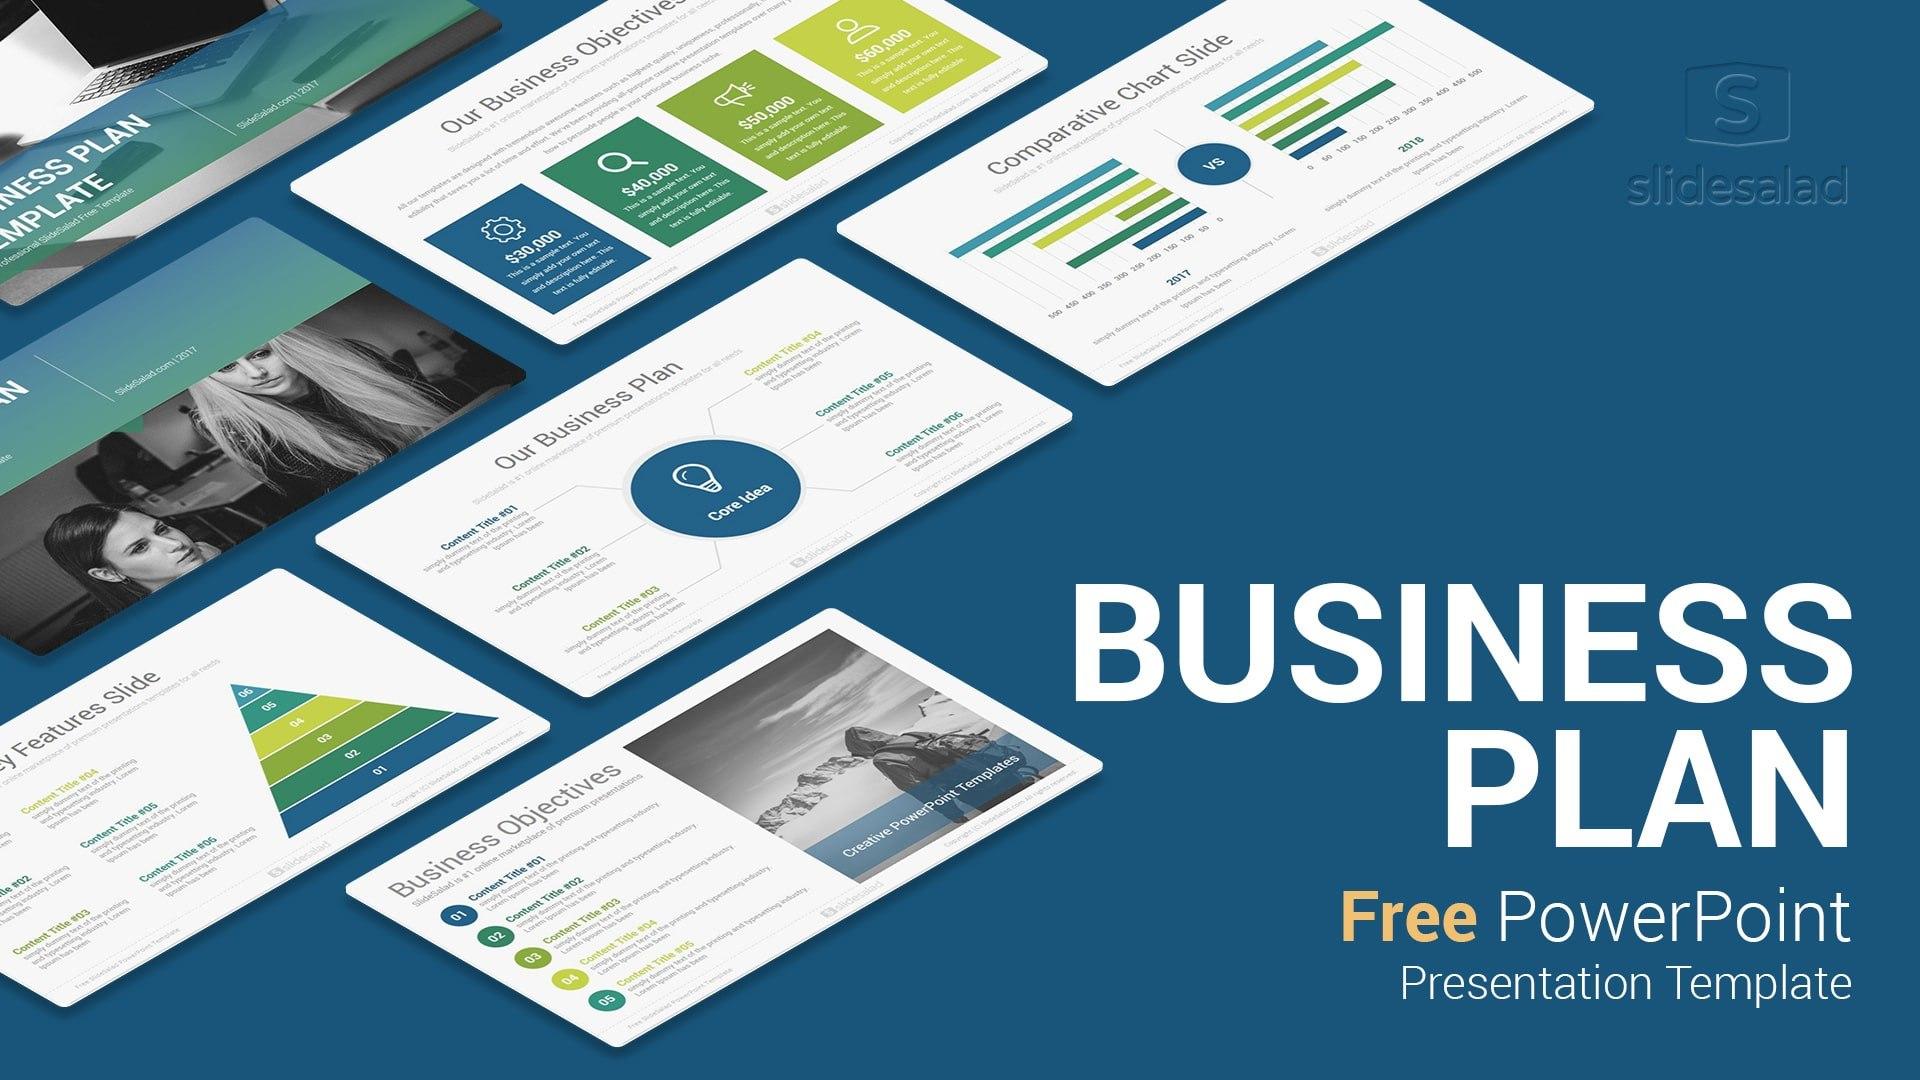 Unique Image Of Pathology Ppt Templates Free Download Best Inside Best Business Presentation Templates Free Download